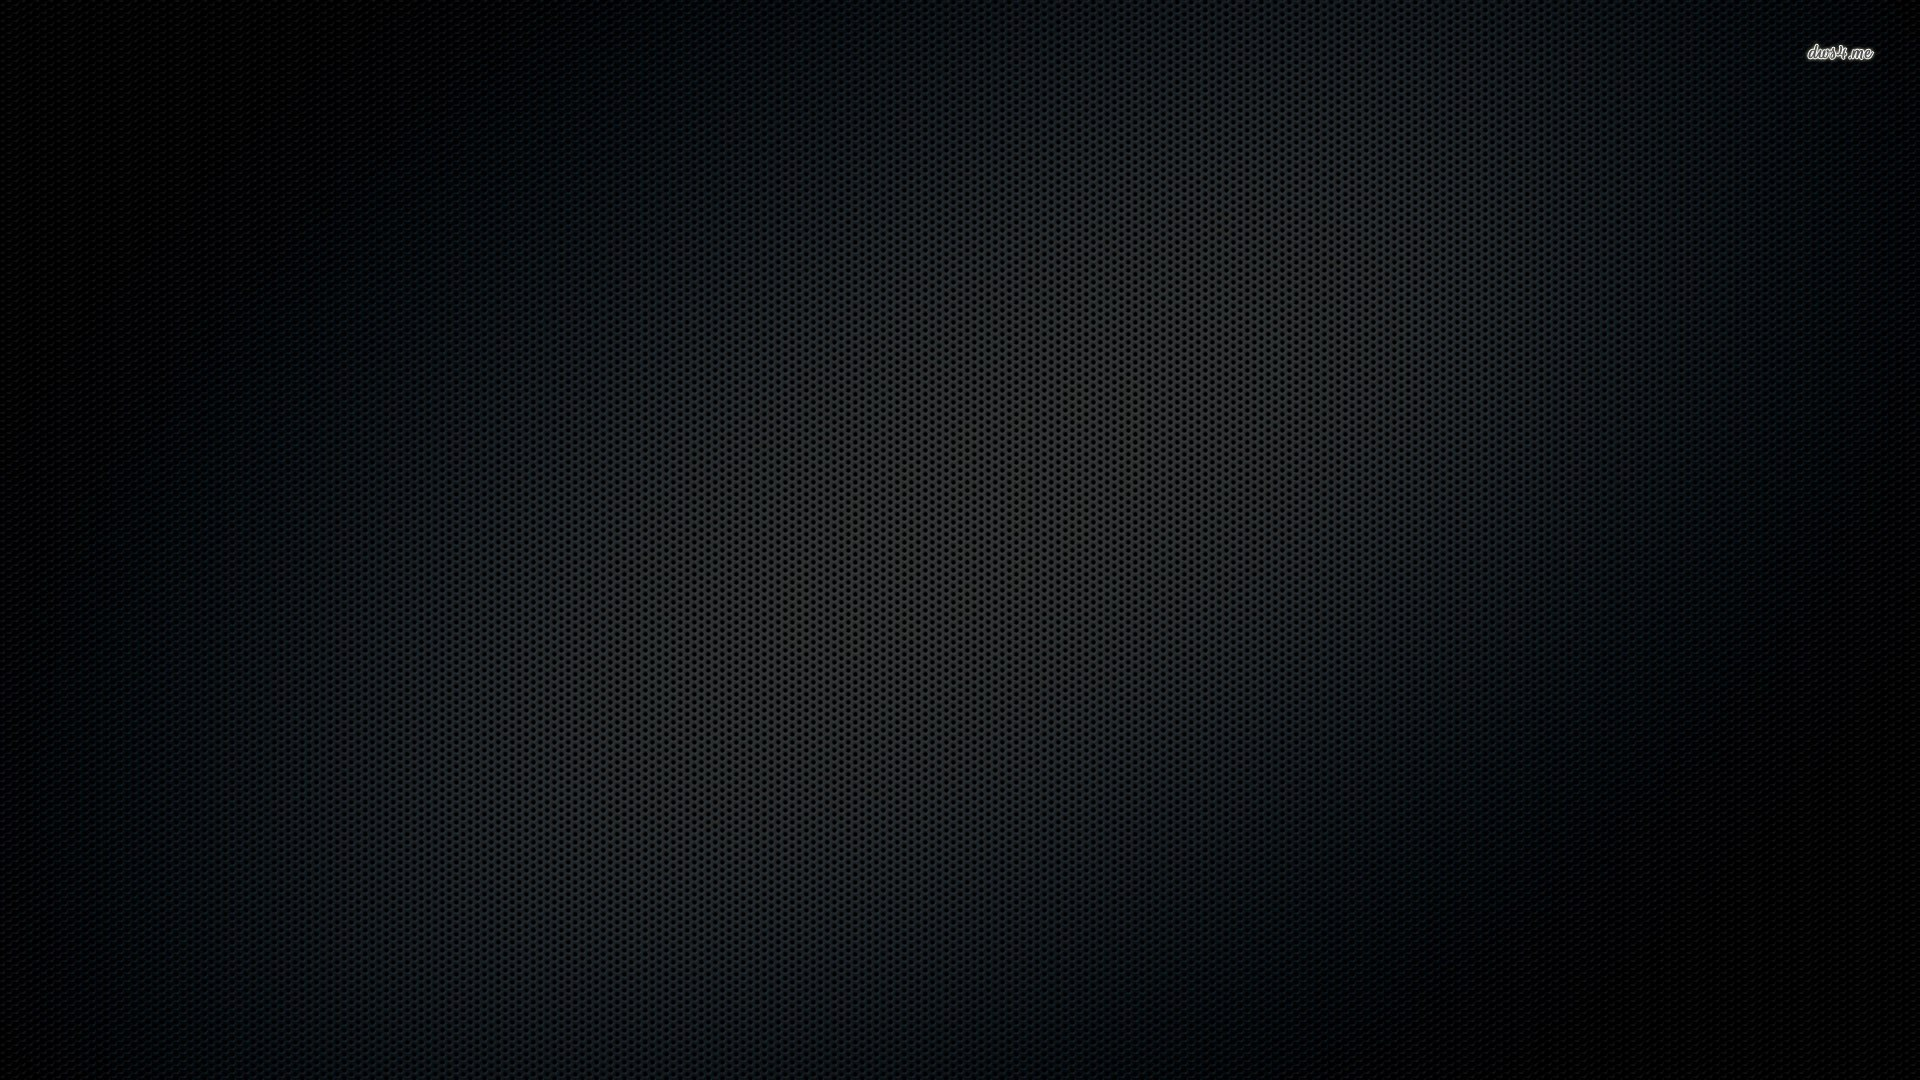 black texture wallpaper hd - photo #11